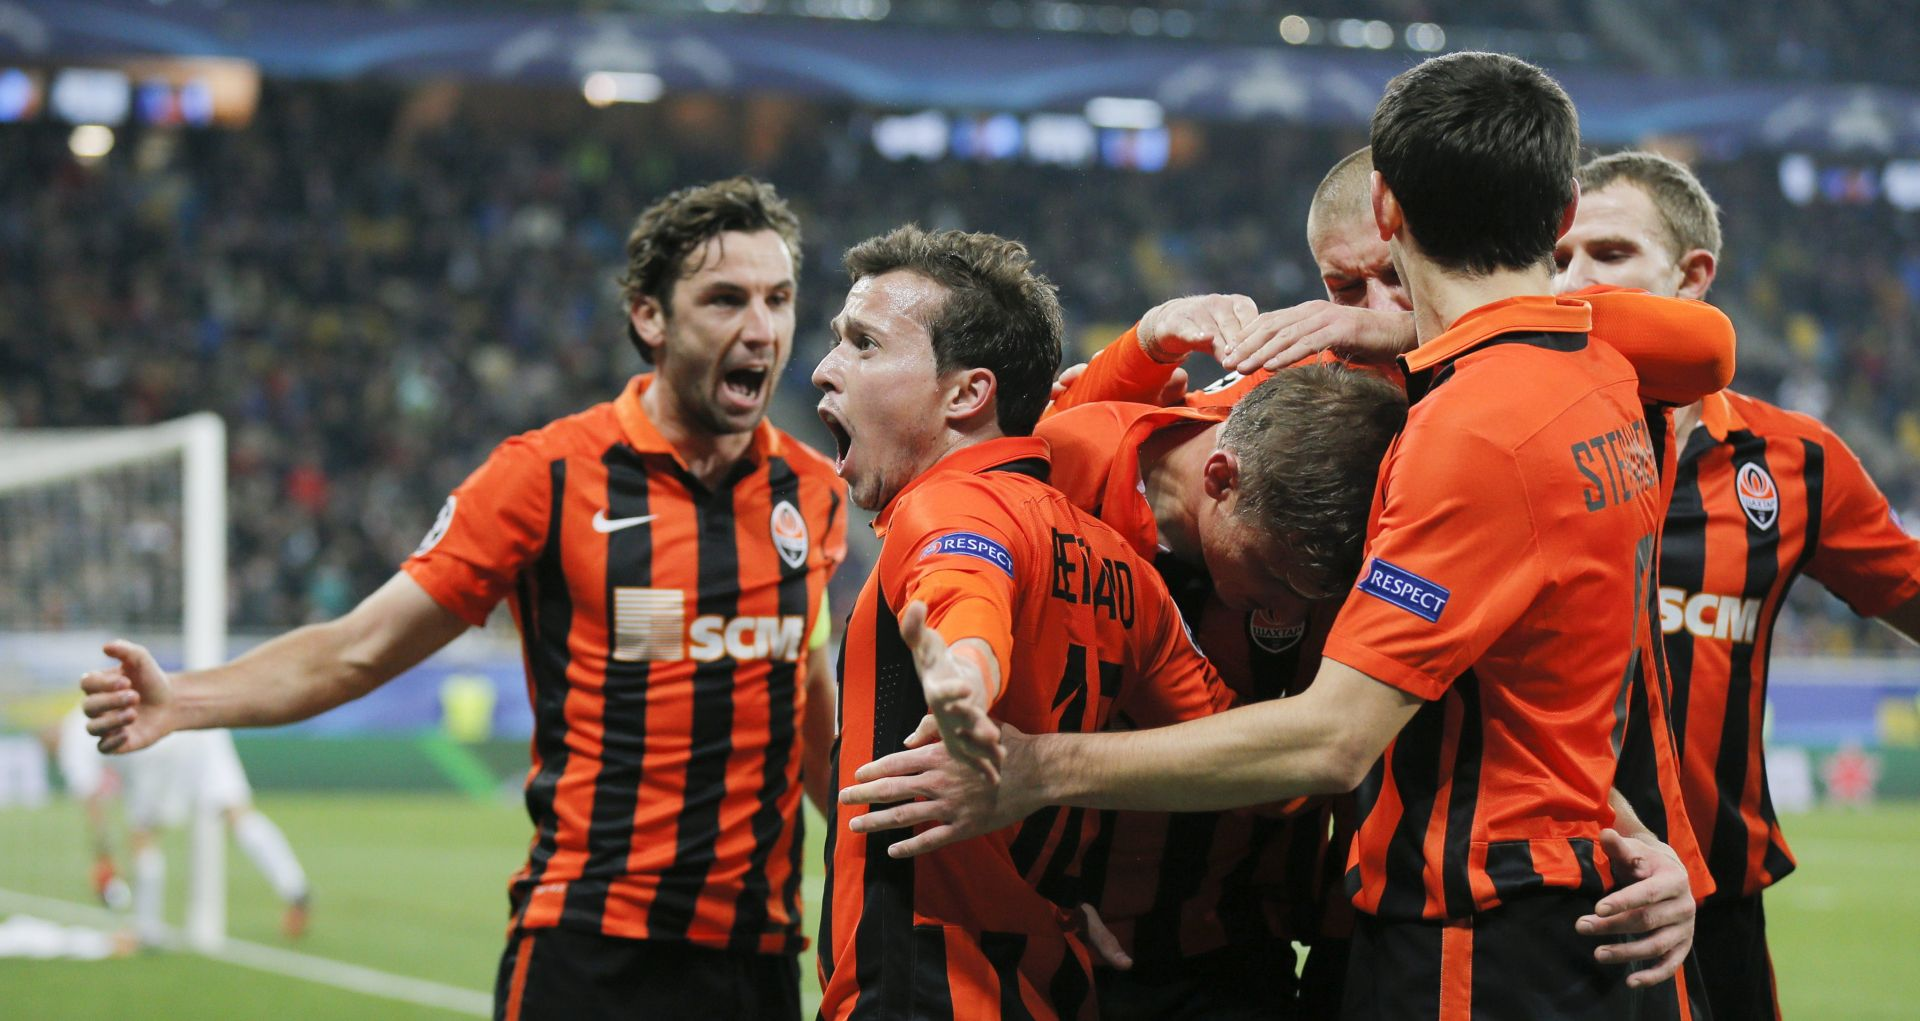 Real i City osigurali prolaz, golovi Srne i Eduarda, Rooney napokon zabio